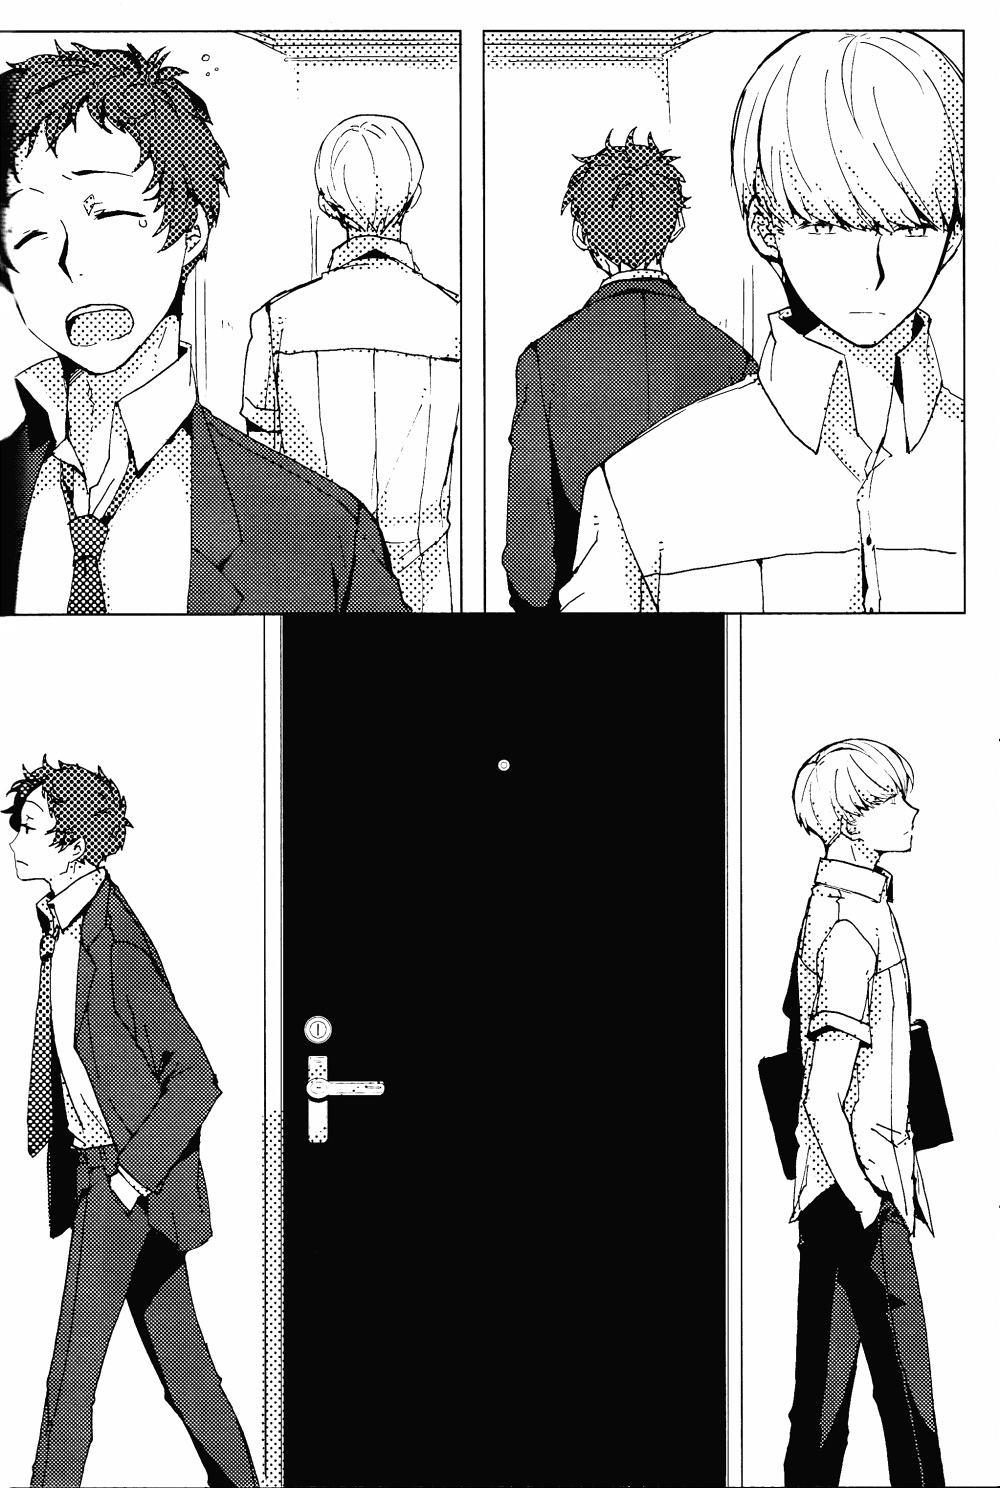 Trang 10 - Chia Sẻ Sự Tĩnh Lặng (- HEART STATION (Ebisushi)) - Truyện tranh Gay - Server HostedOnGoogleServerStaging